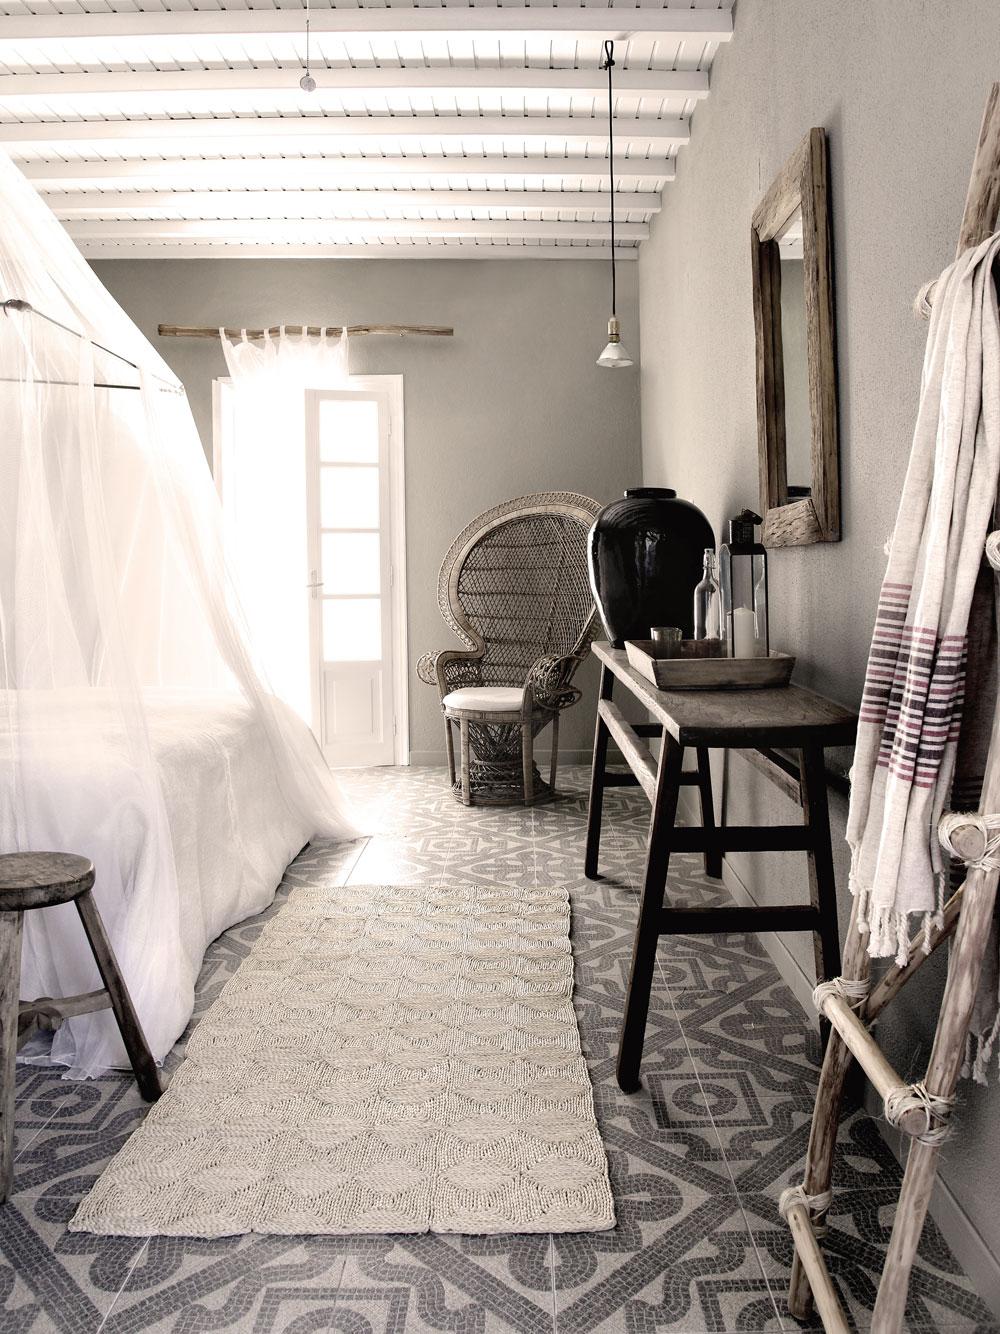 TSJ_San_Giorgio_Mykonos_Hotel_Greece_1000X1334_14